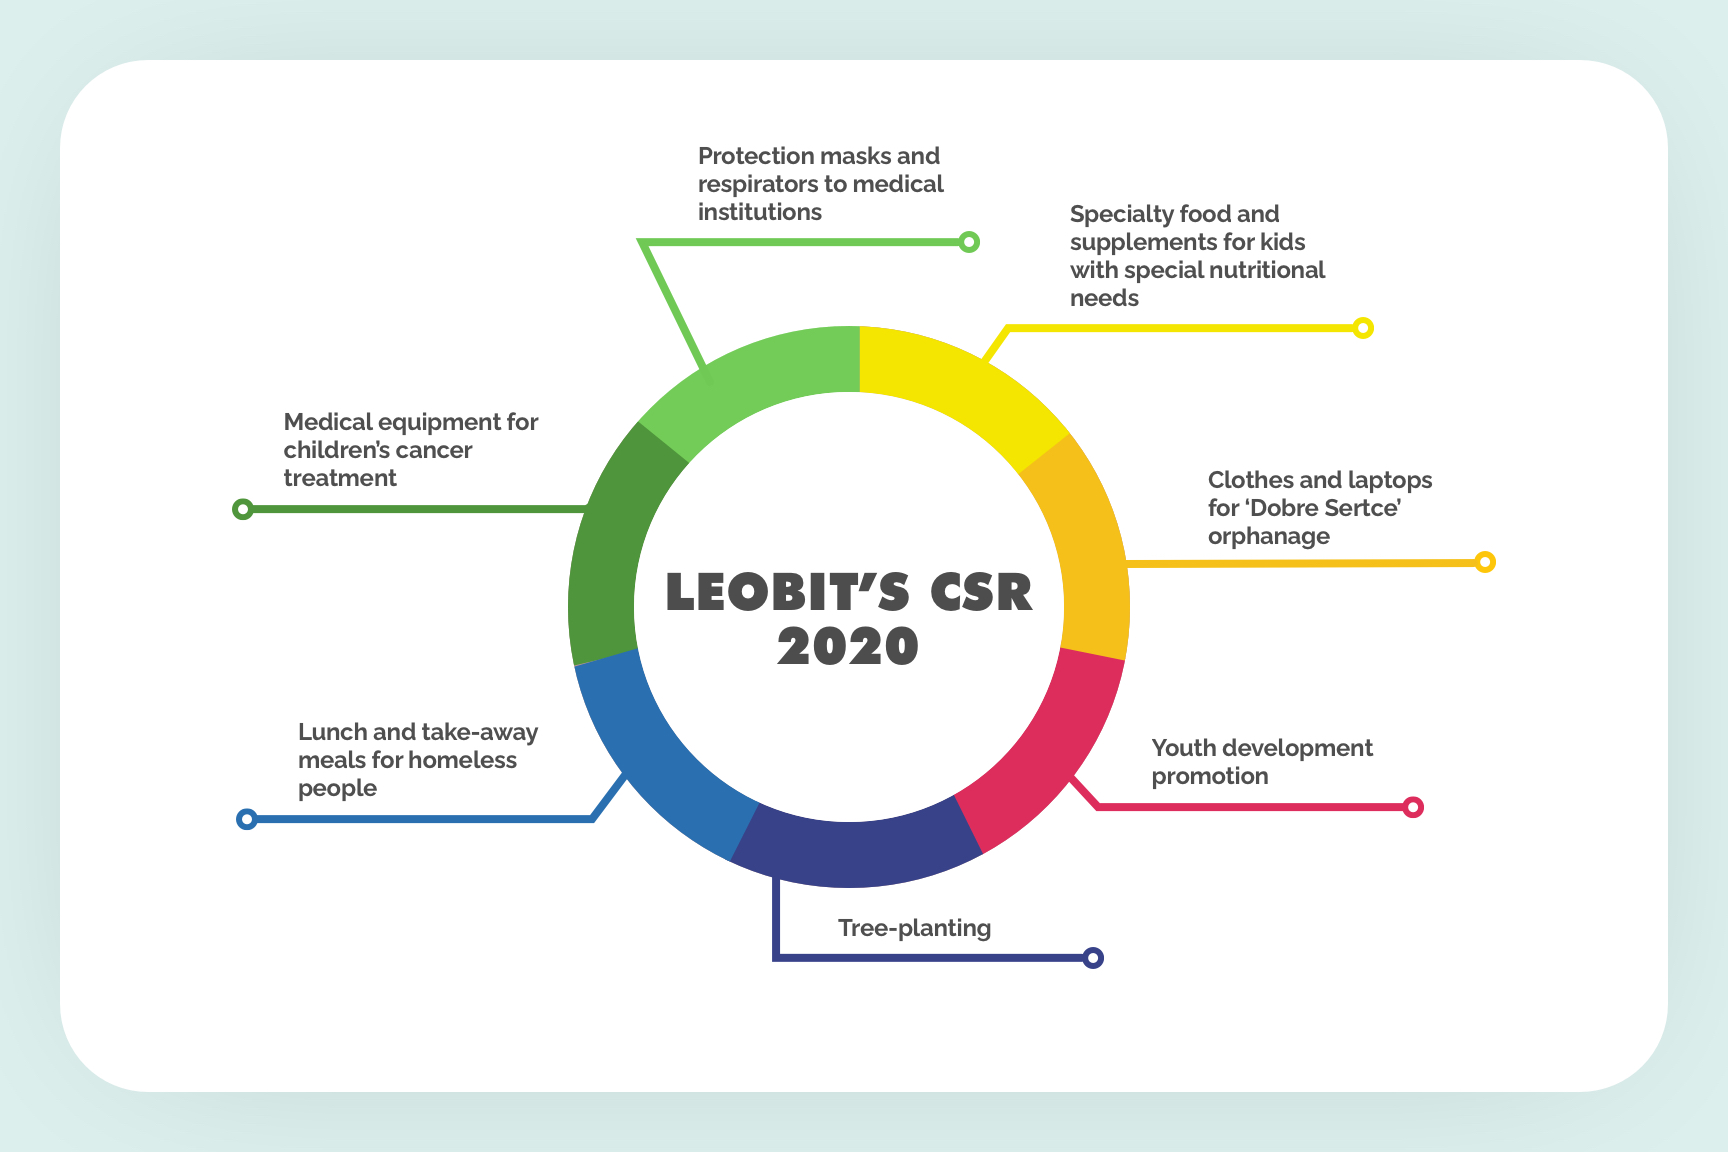 Charity at Leobit